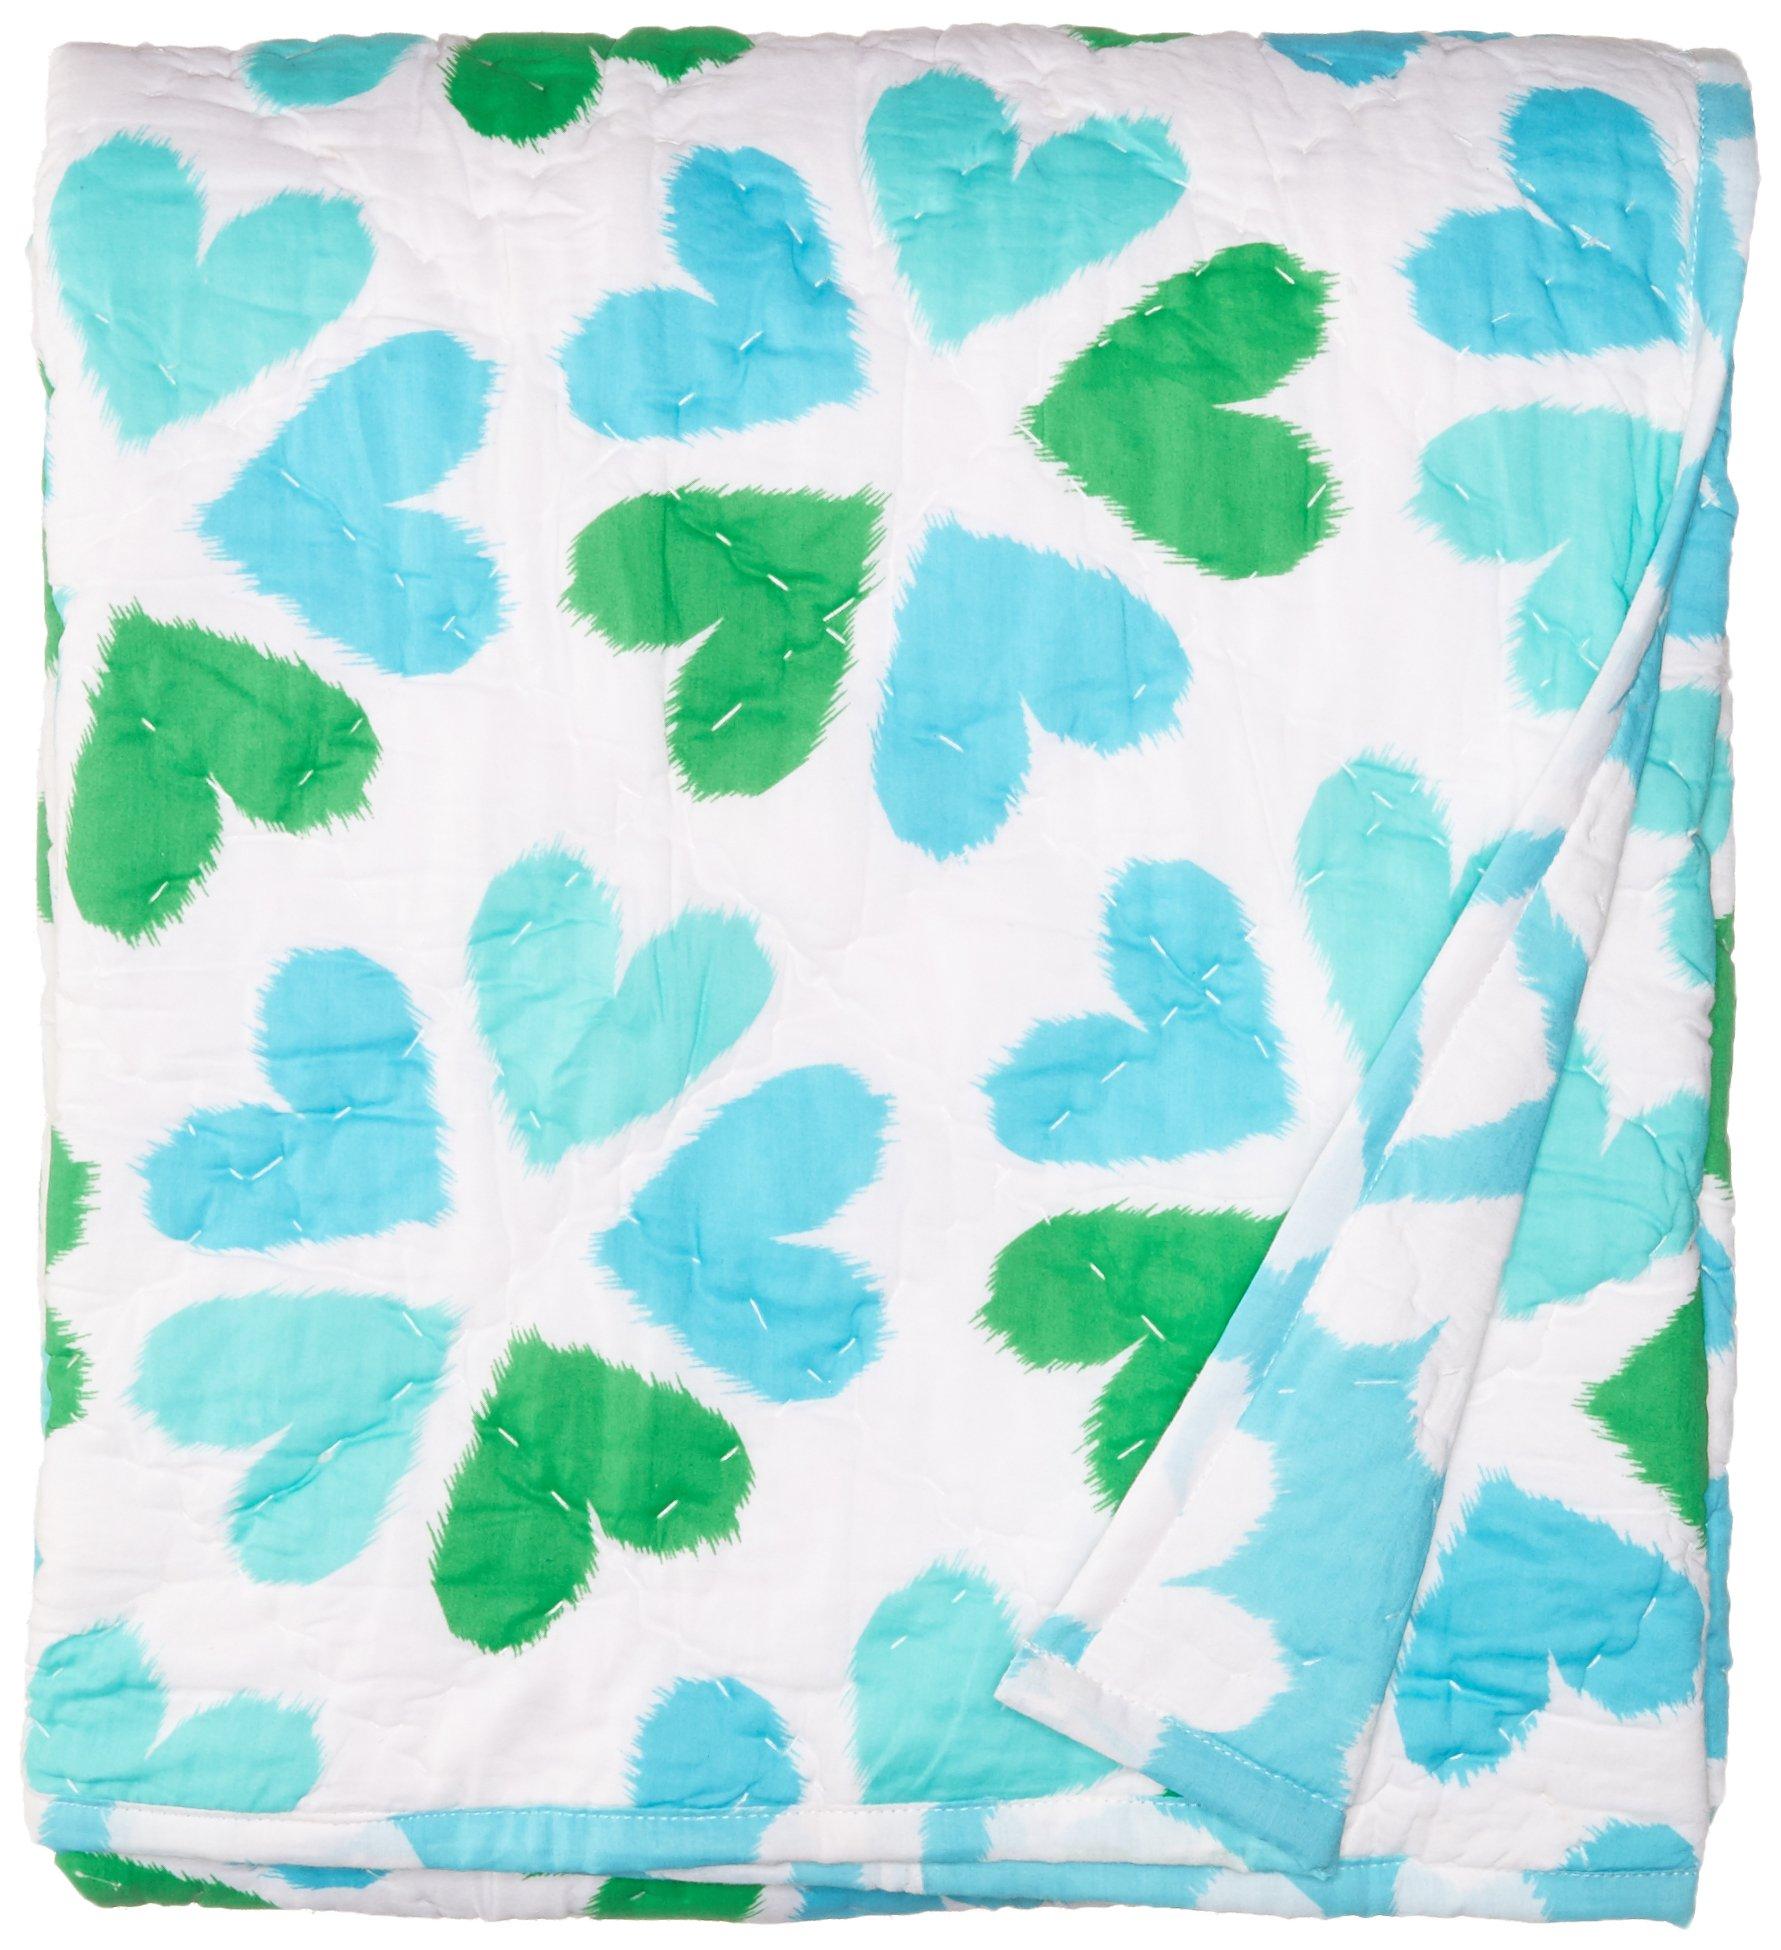 Masala Baby Baby Mokshareversible Quilt, Flower Heart Turquoise, 40x60 by Masala Baby